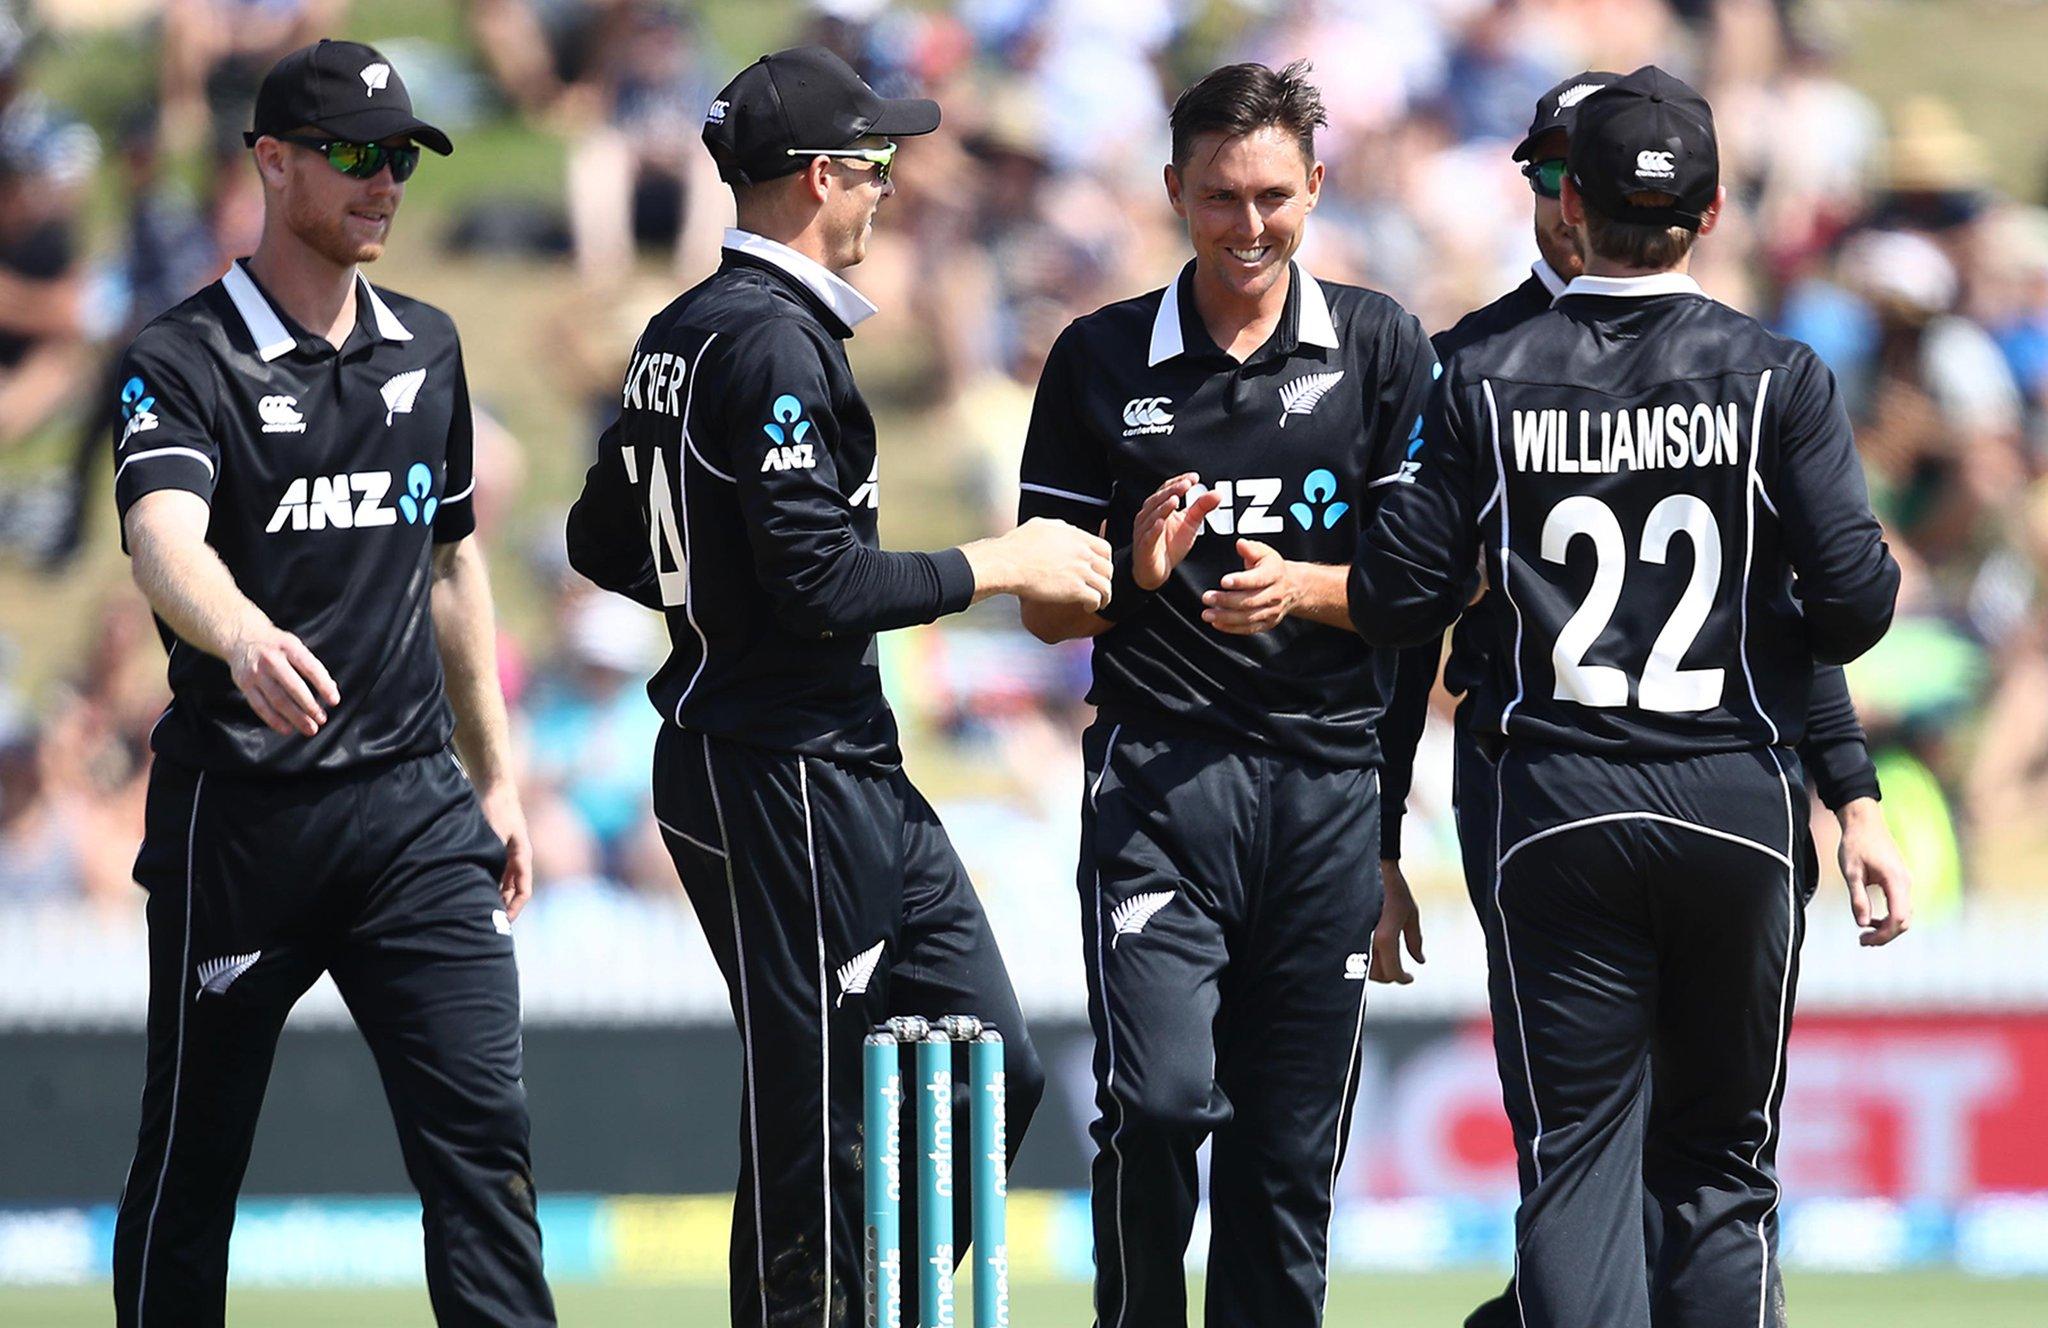 newzealand team ( image source: twitter)